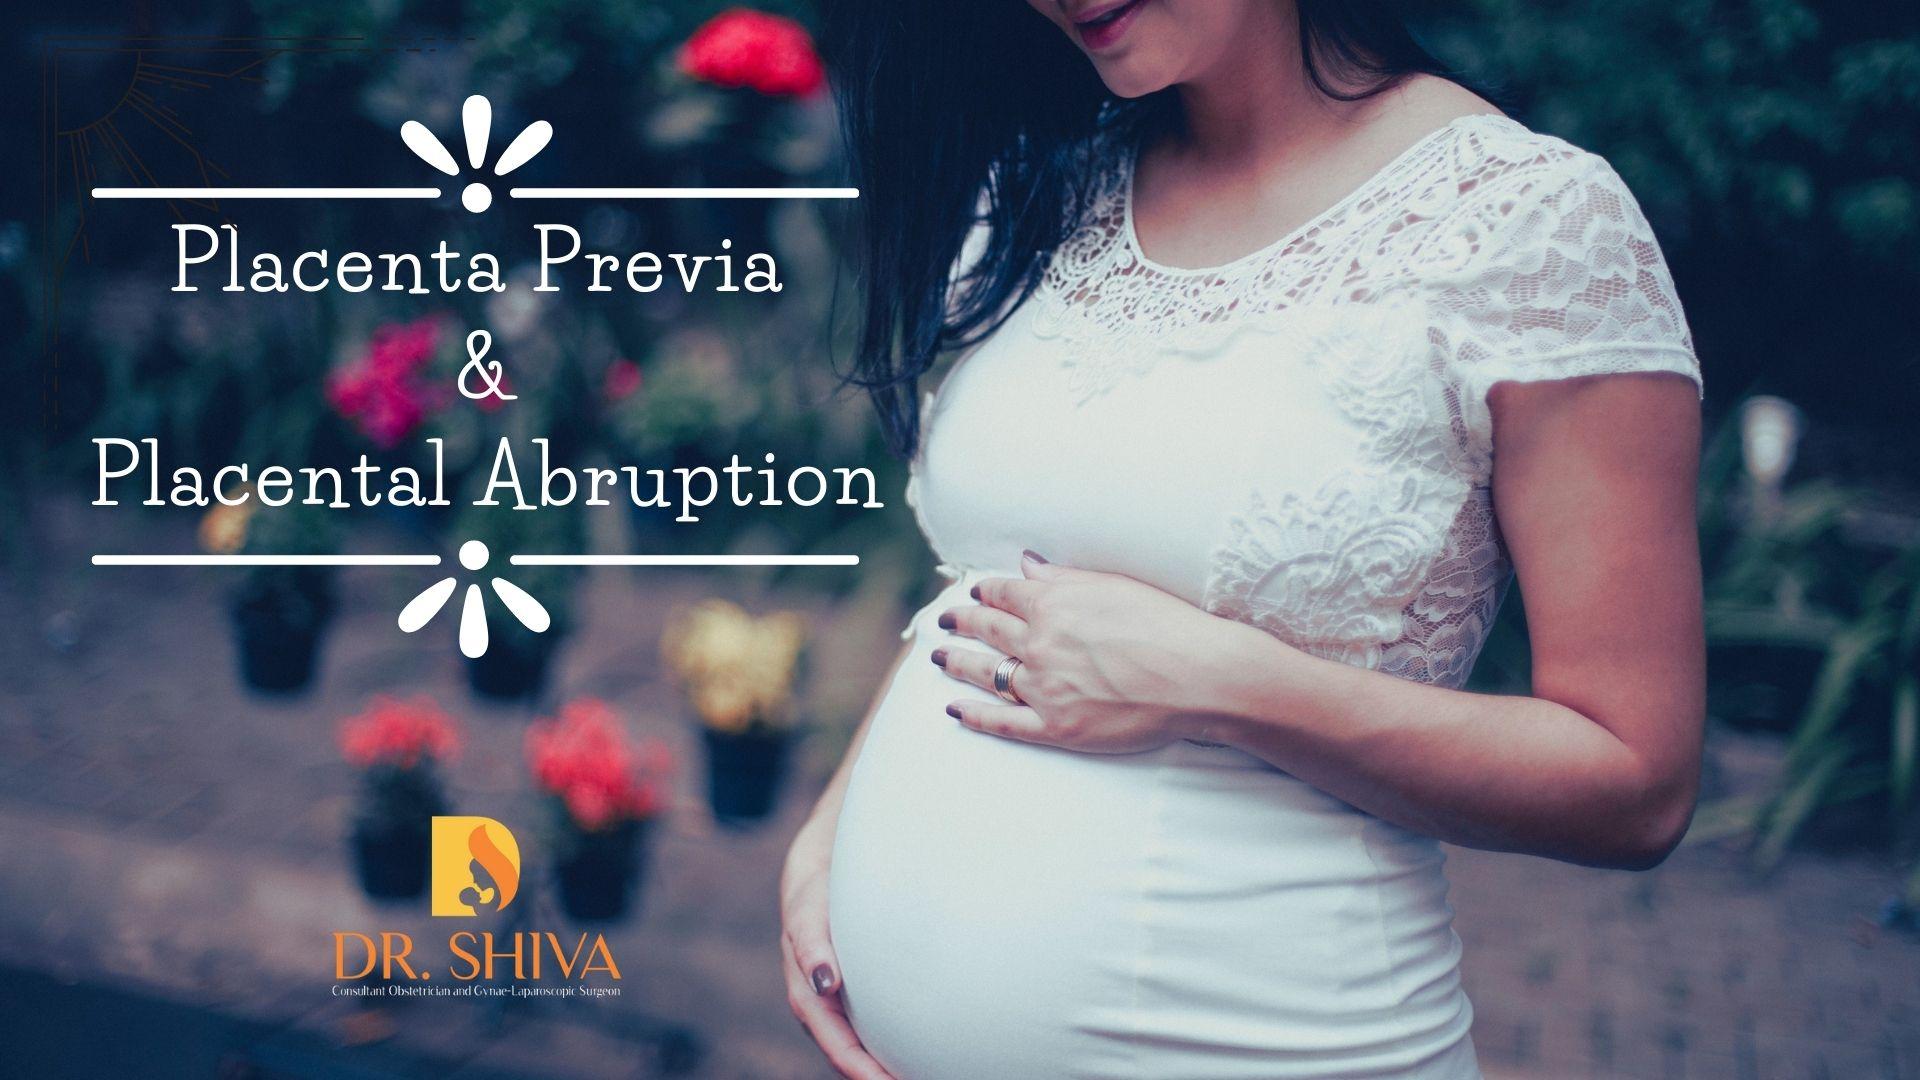 Placenta previa and Placental abruption